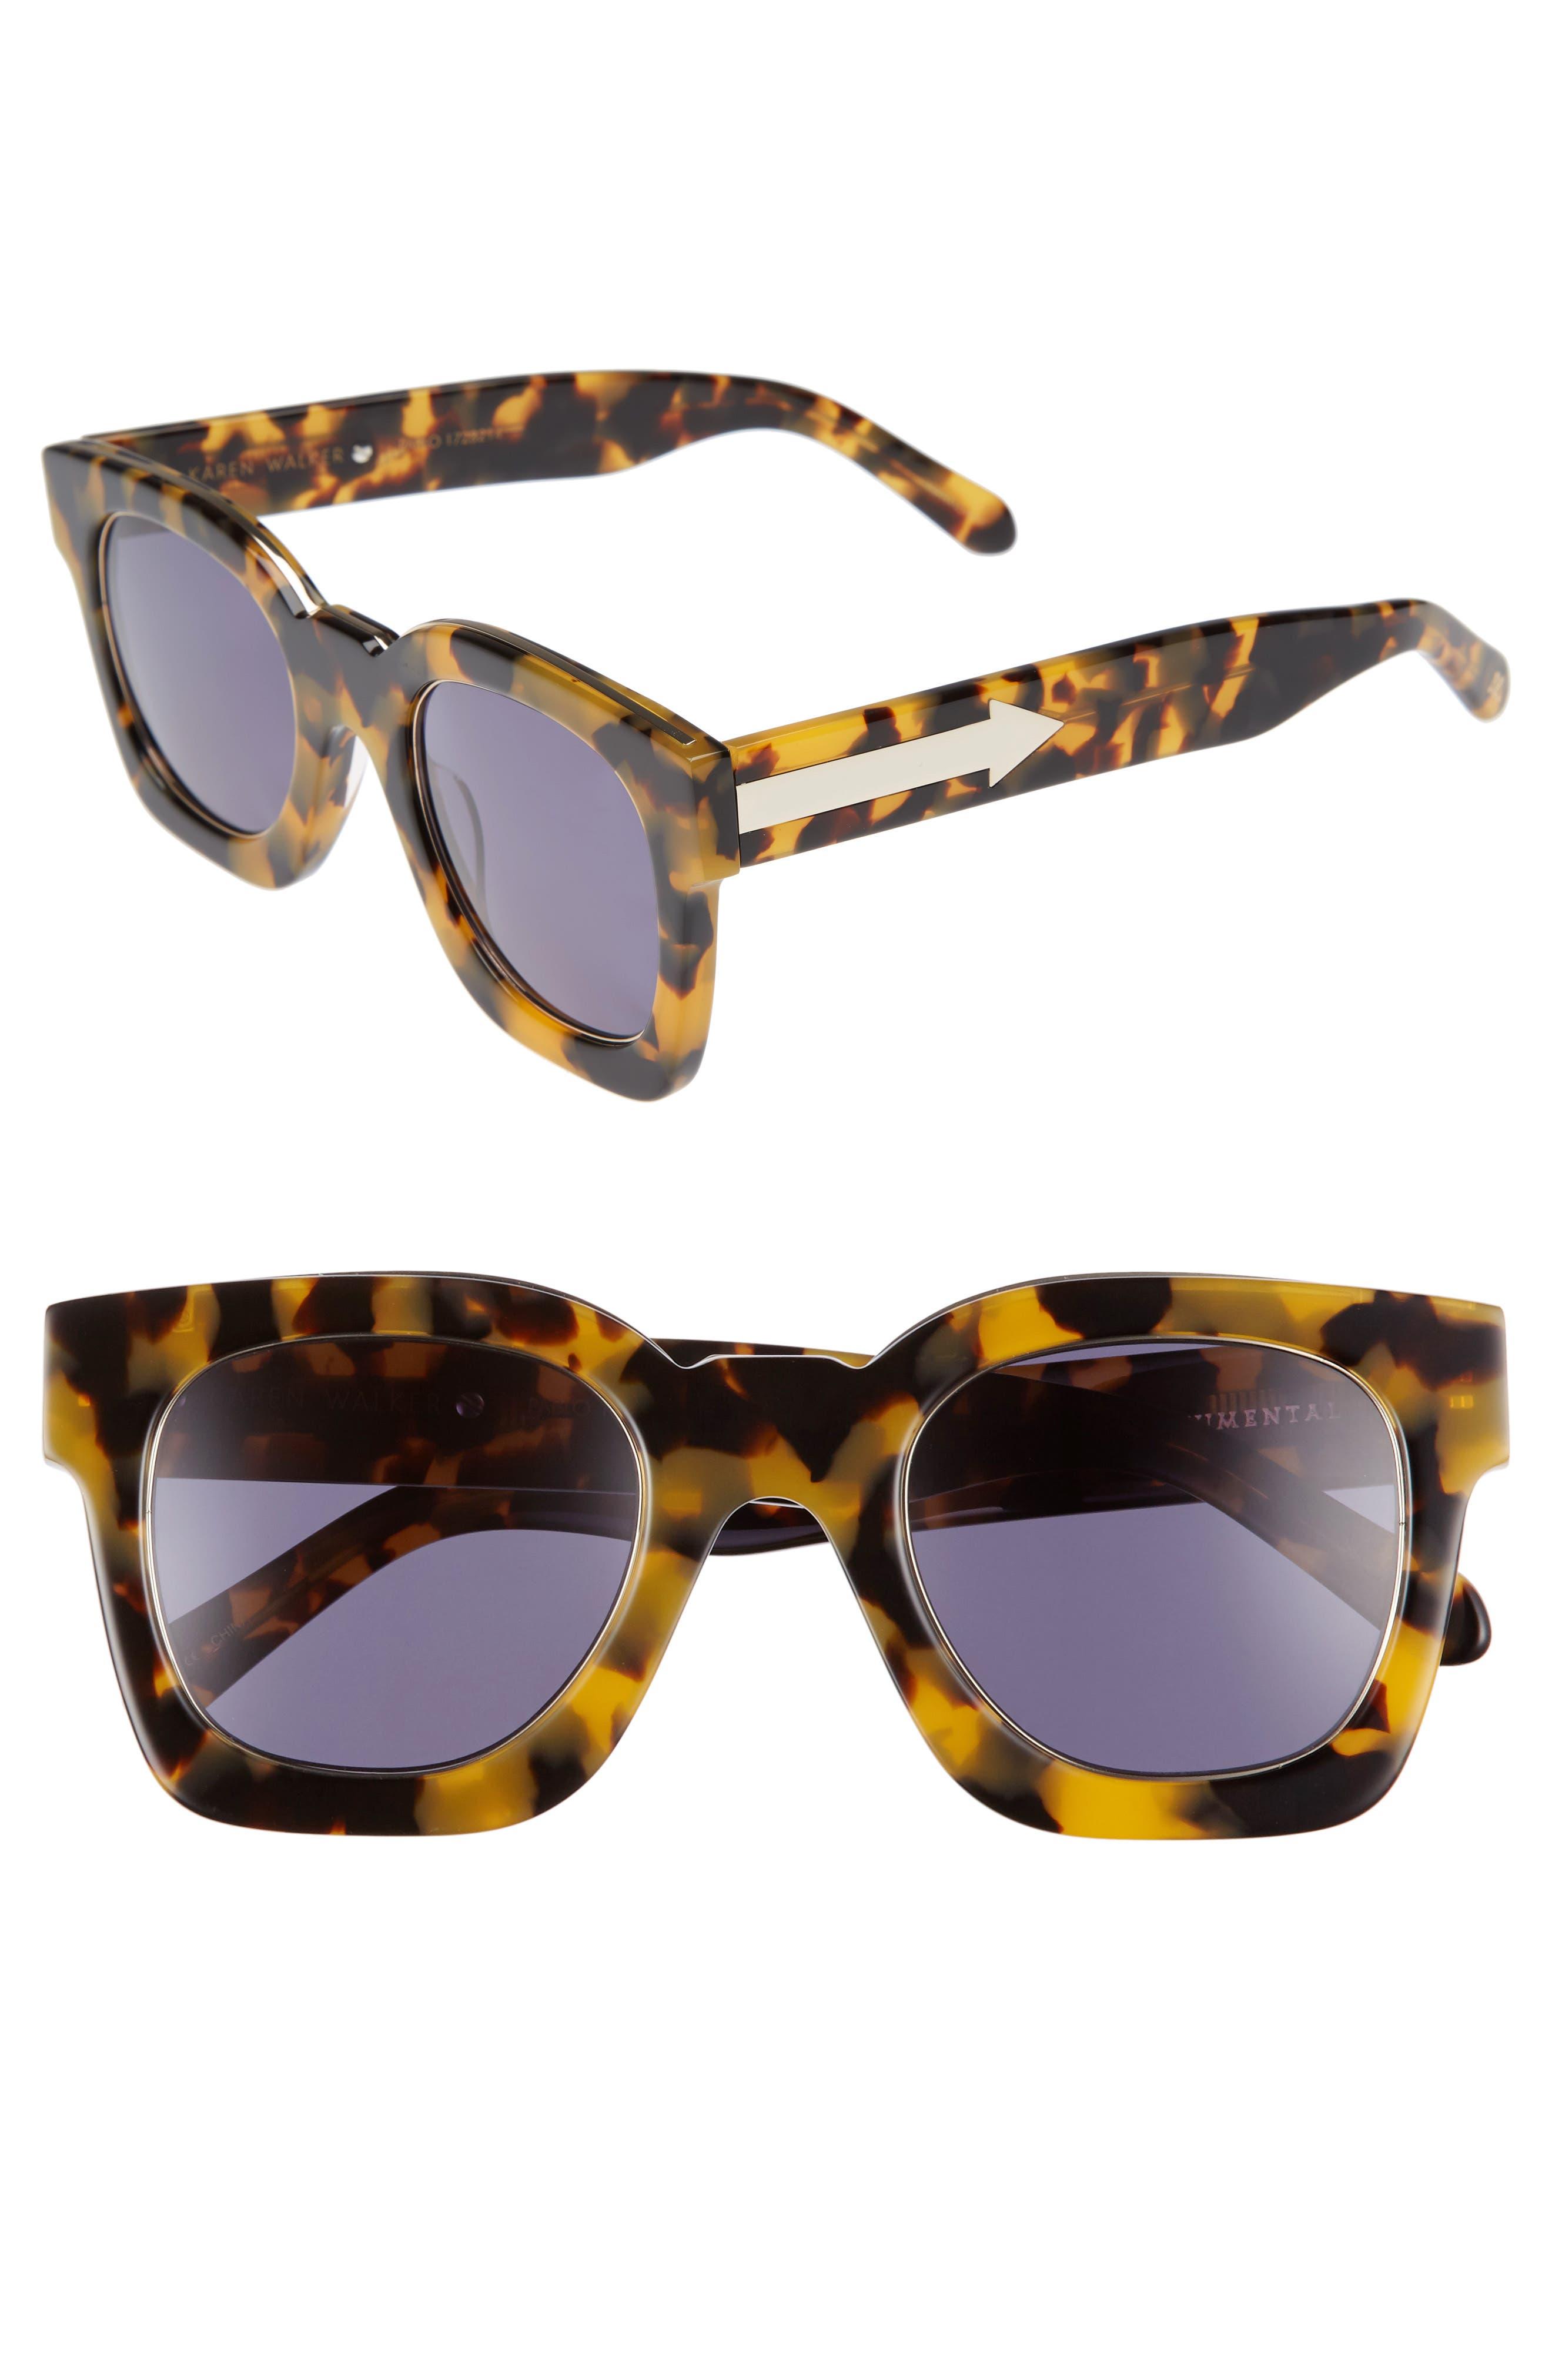 Main Image - Karen Walker x Monumental Pablo 50mm Polarized Sunglasses